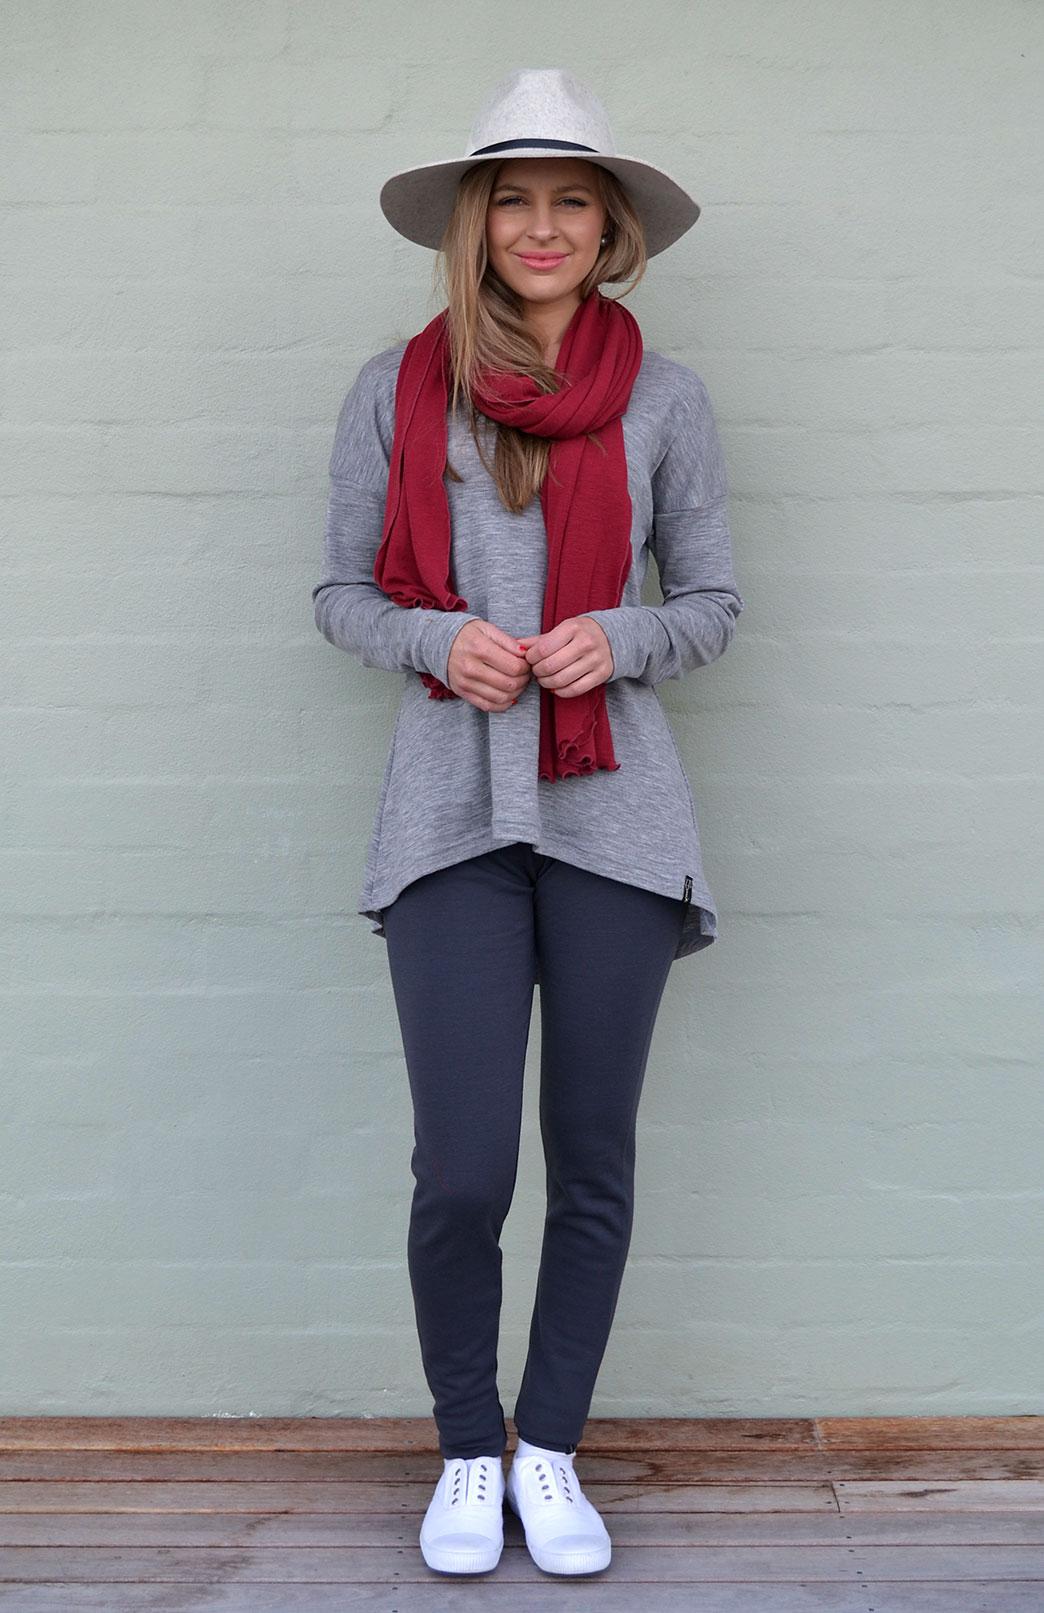 Lola Top - Women's Grey Merino Wool Long Sleeve Lola Top - Smitten Merino Tasmania Australia